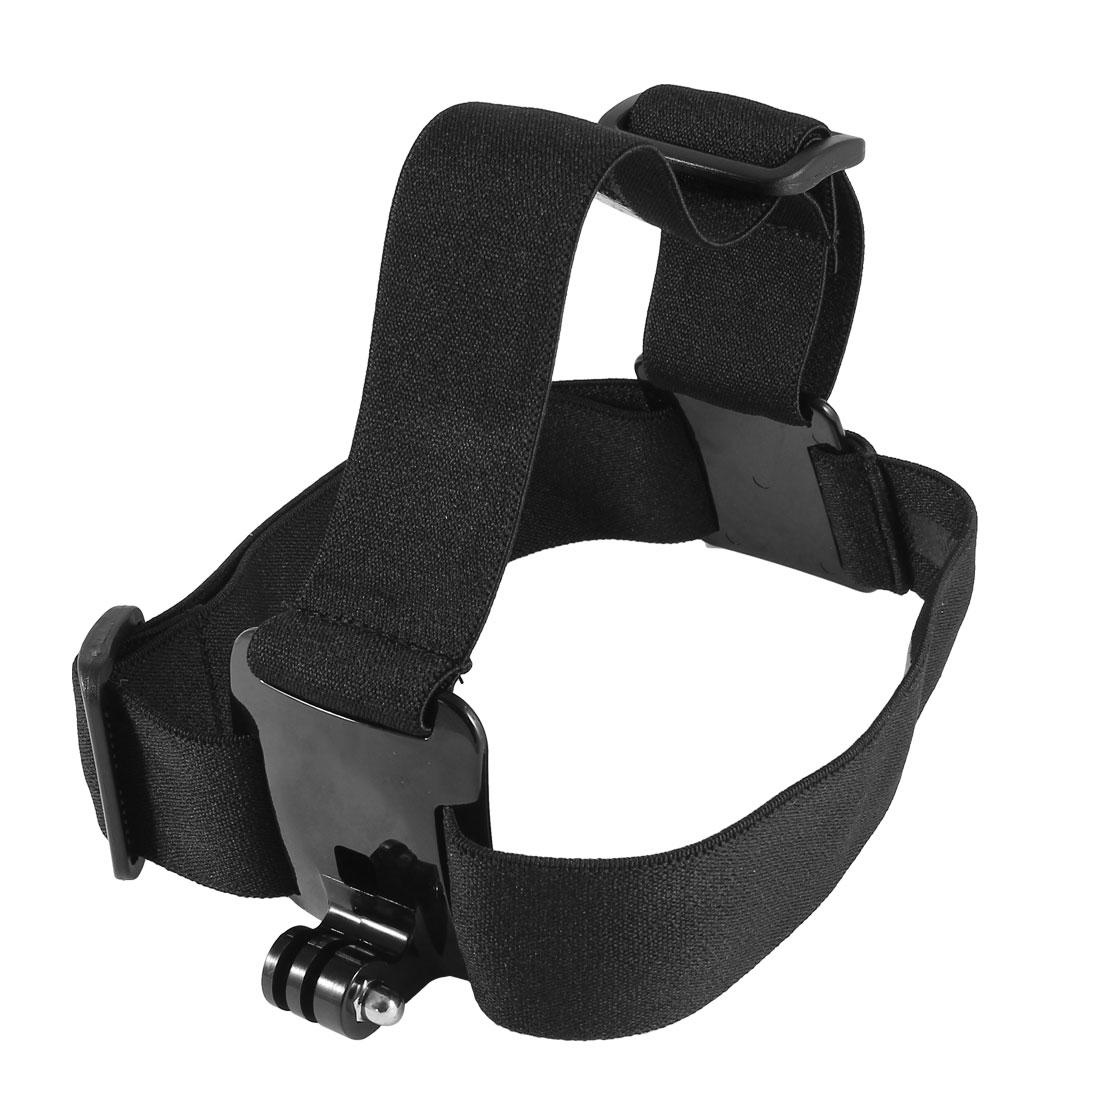 Elastic Adjustable Head Strap Mount for GoPro HERO HERO2 HERO3